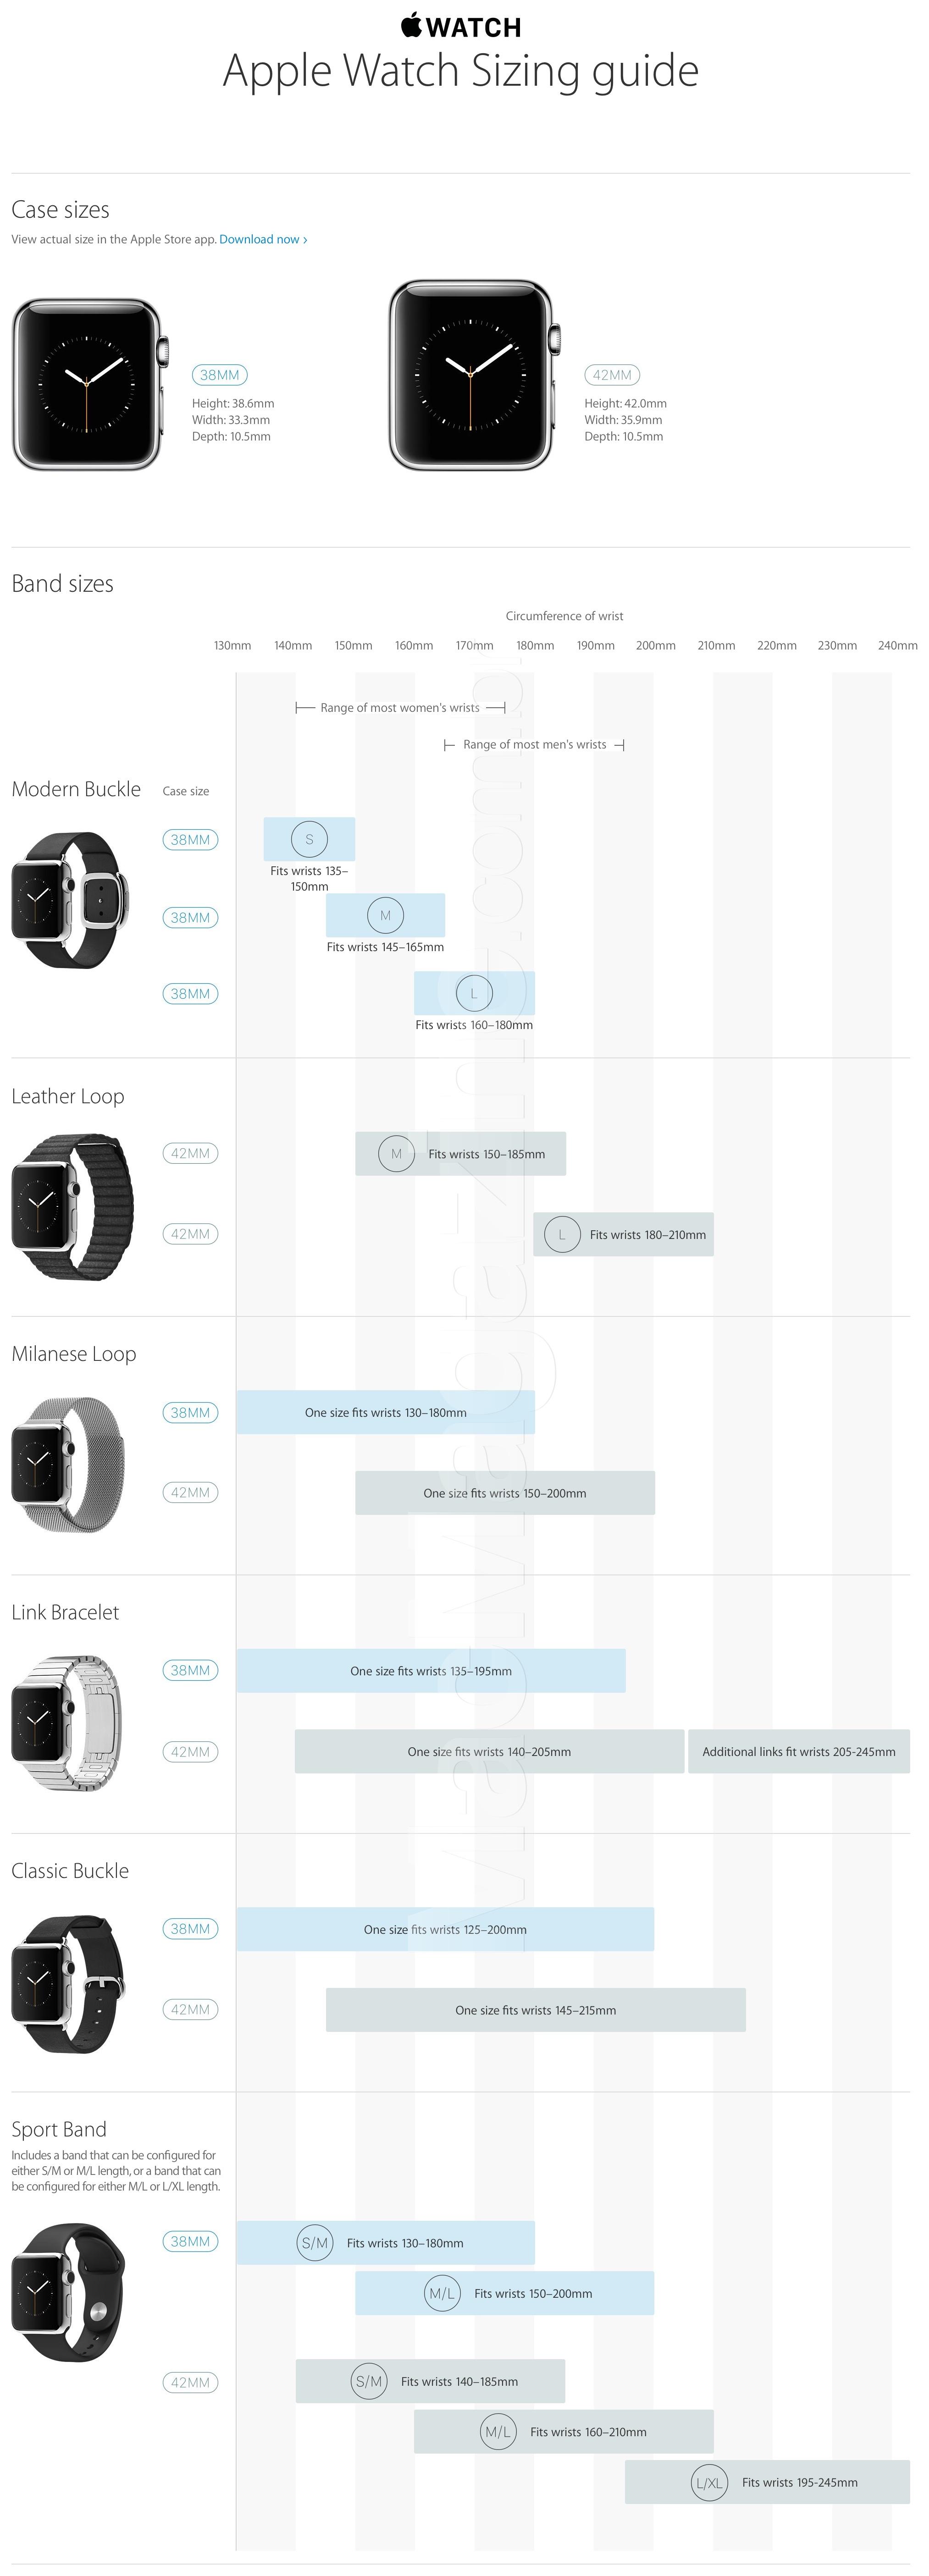 Tamanhos das pulseiras do Apple Watch